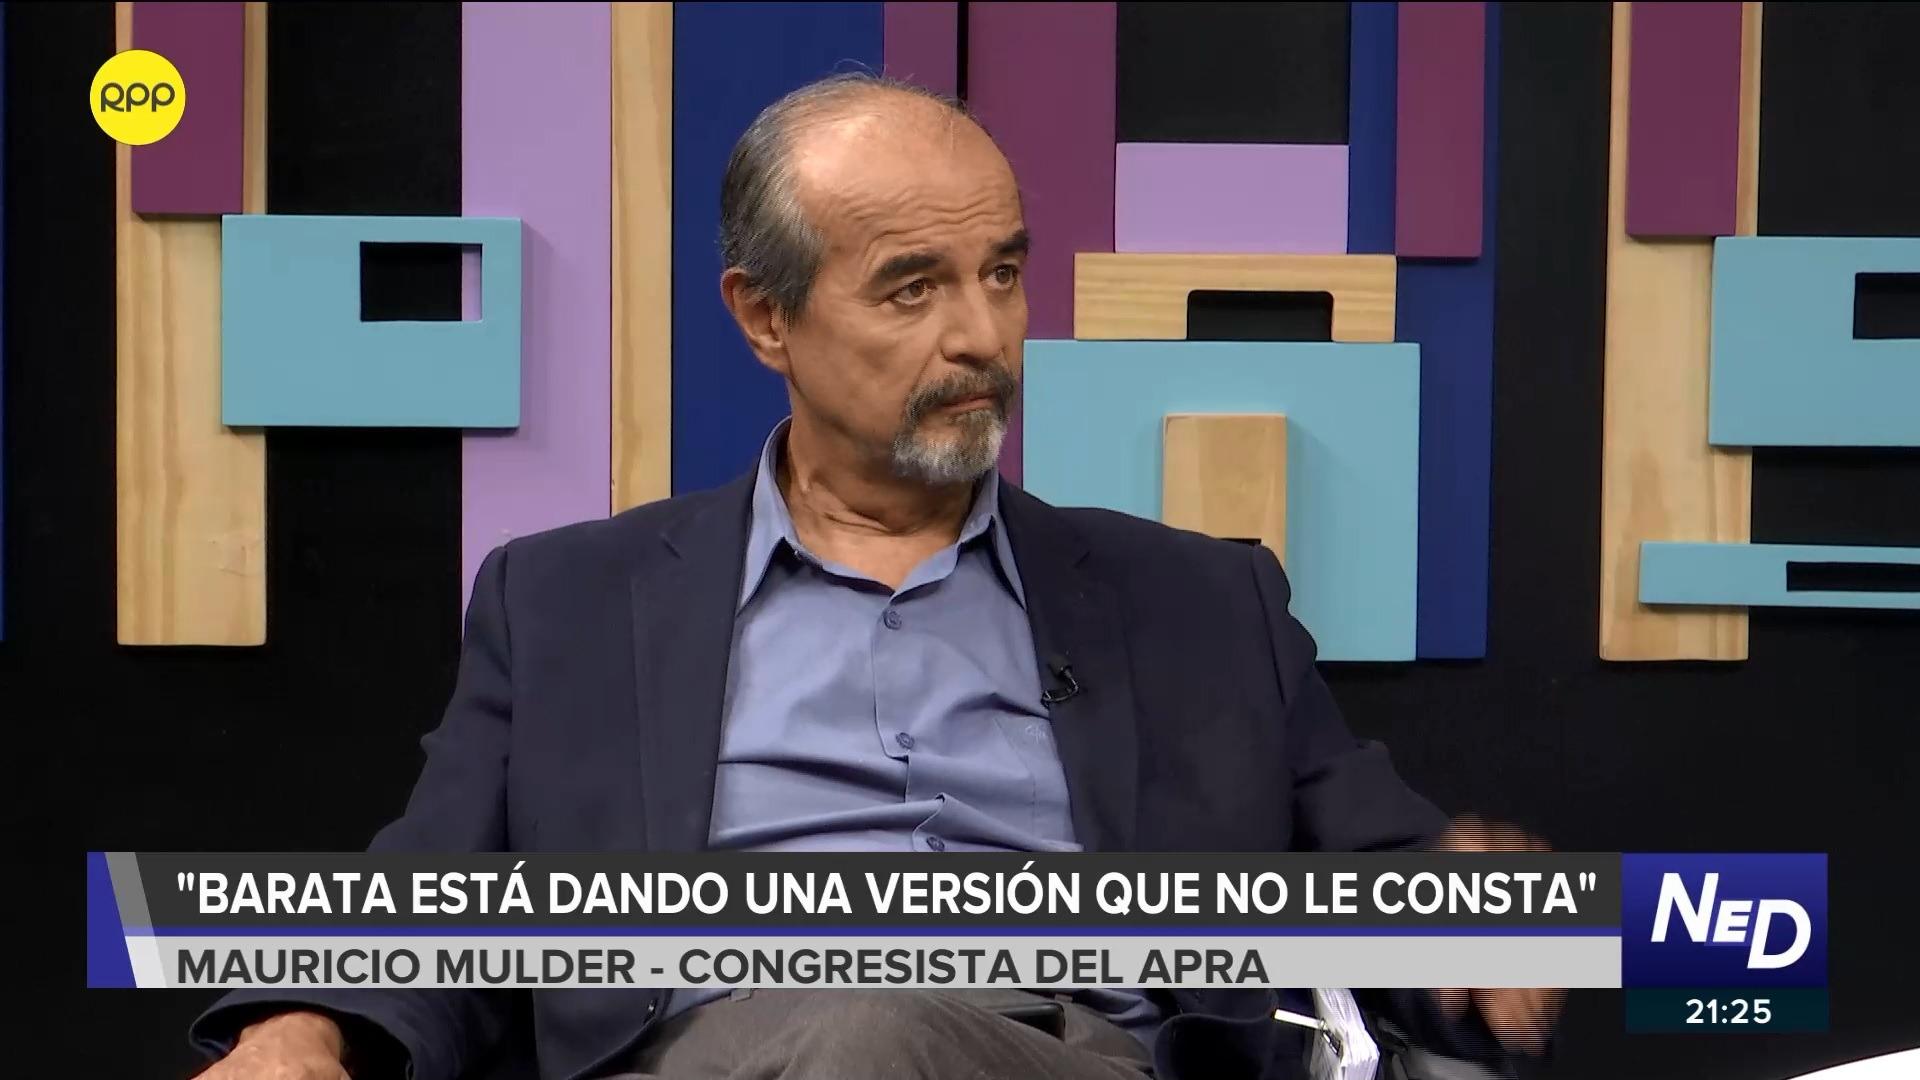 El parlamentario se pronunció sobre las recientes declaraciones de Jorge Barata.